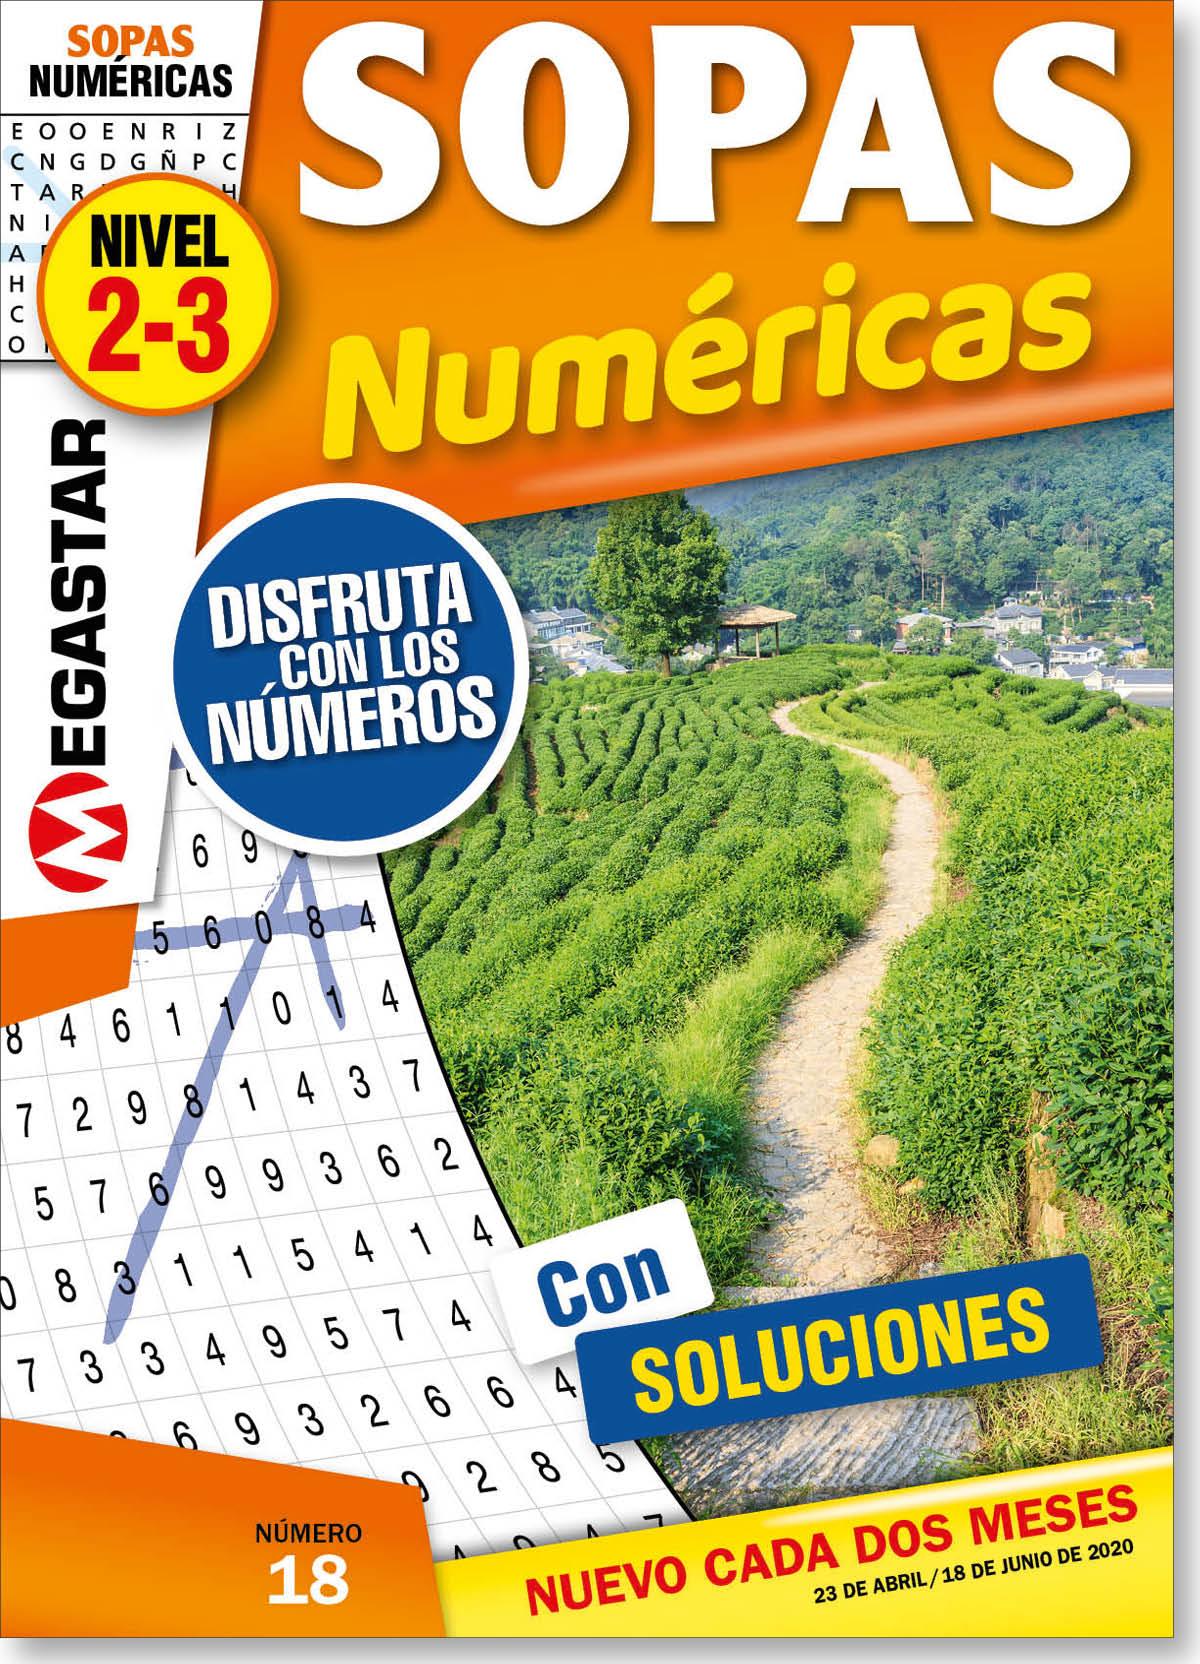 Sopas Numéricas 2-3